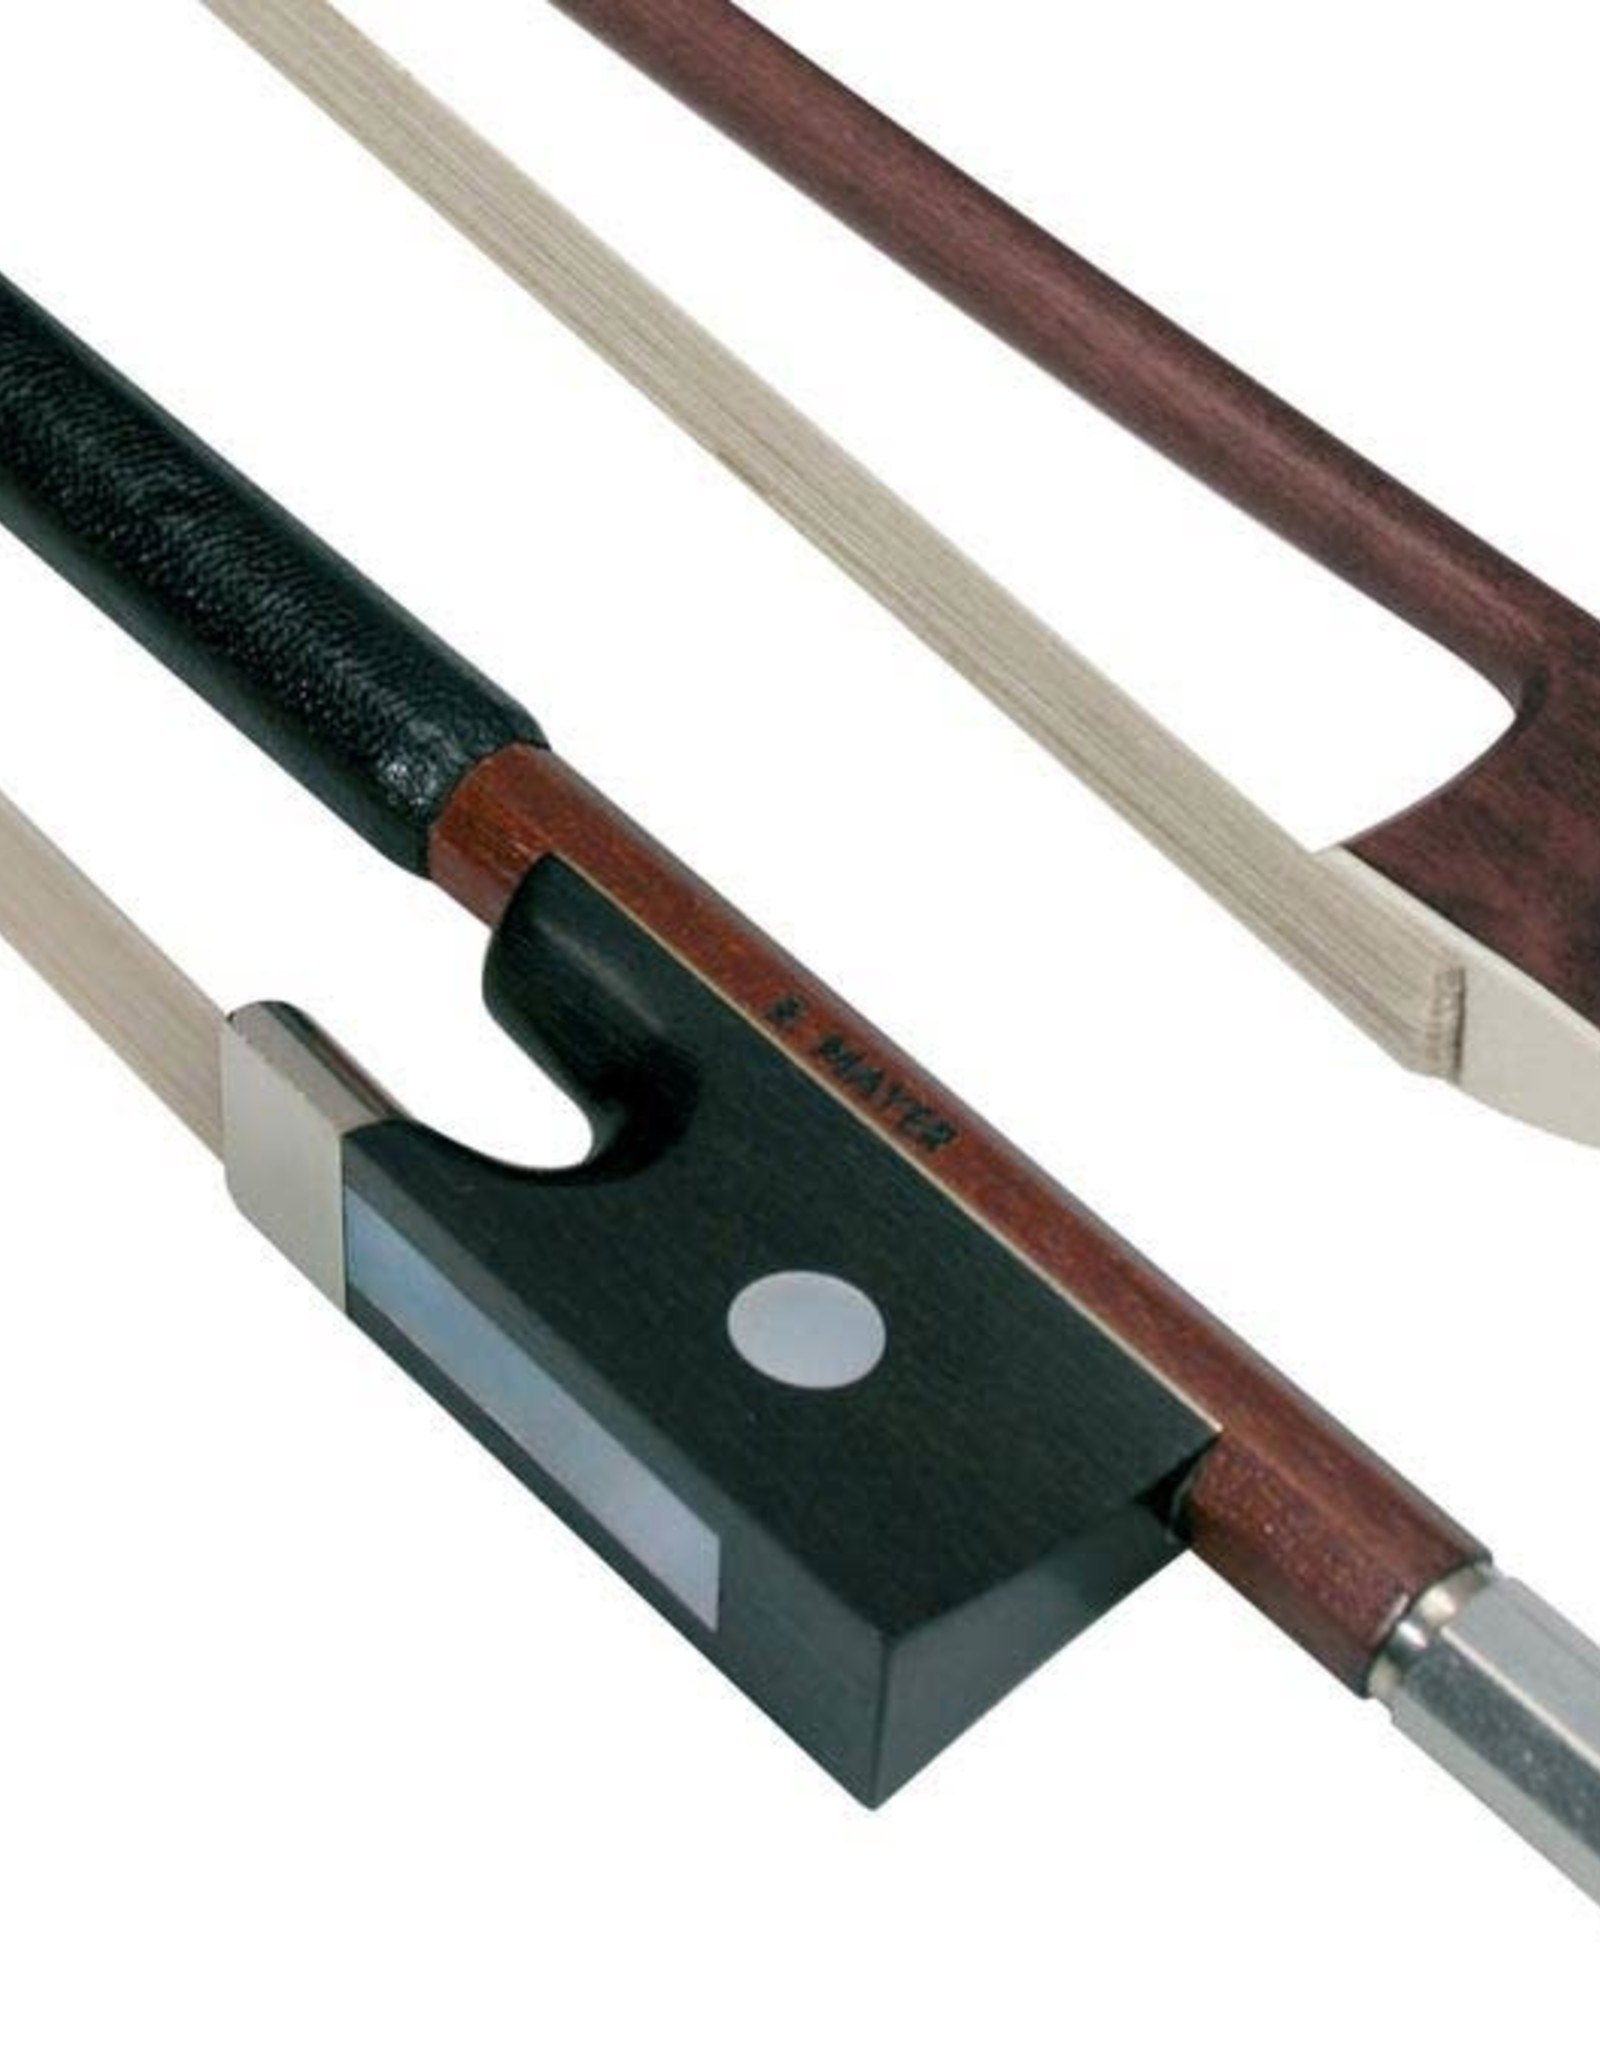 DORFLER DV6, strijkstok viool, verschillende maten, massaranduba, rond